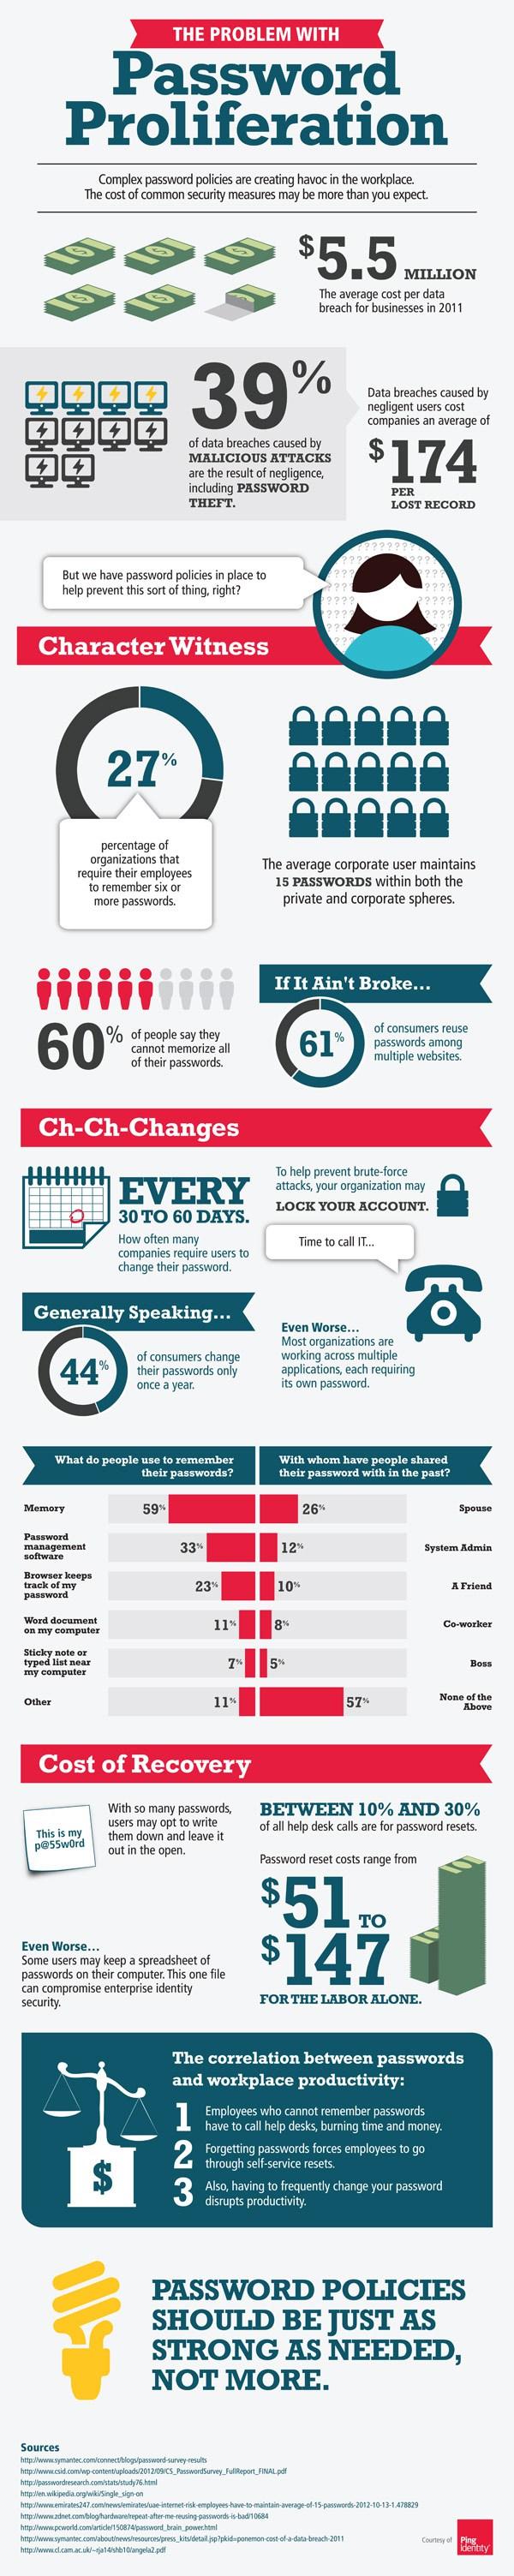 passwod_proliferation_infographic